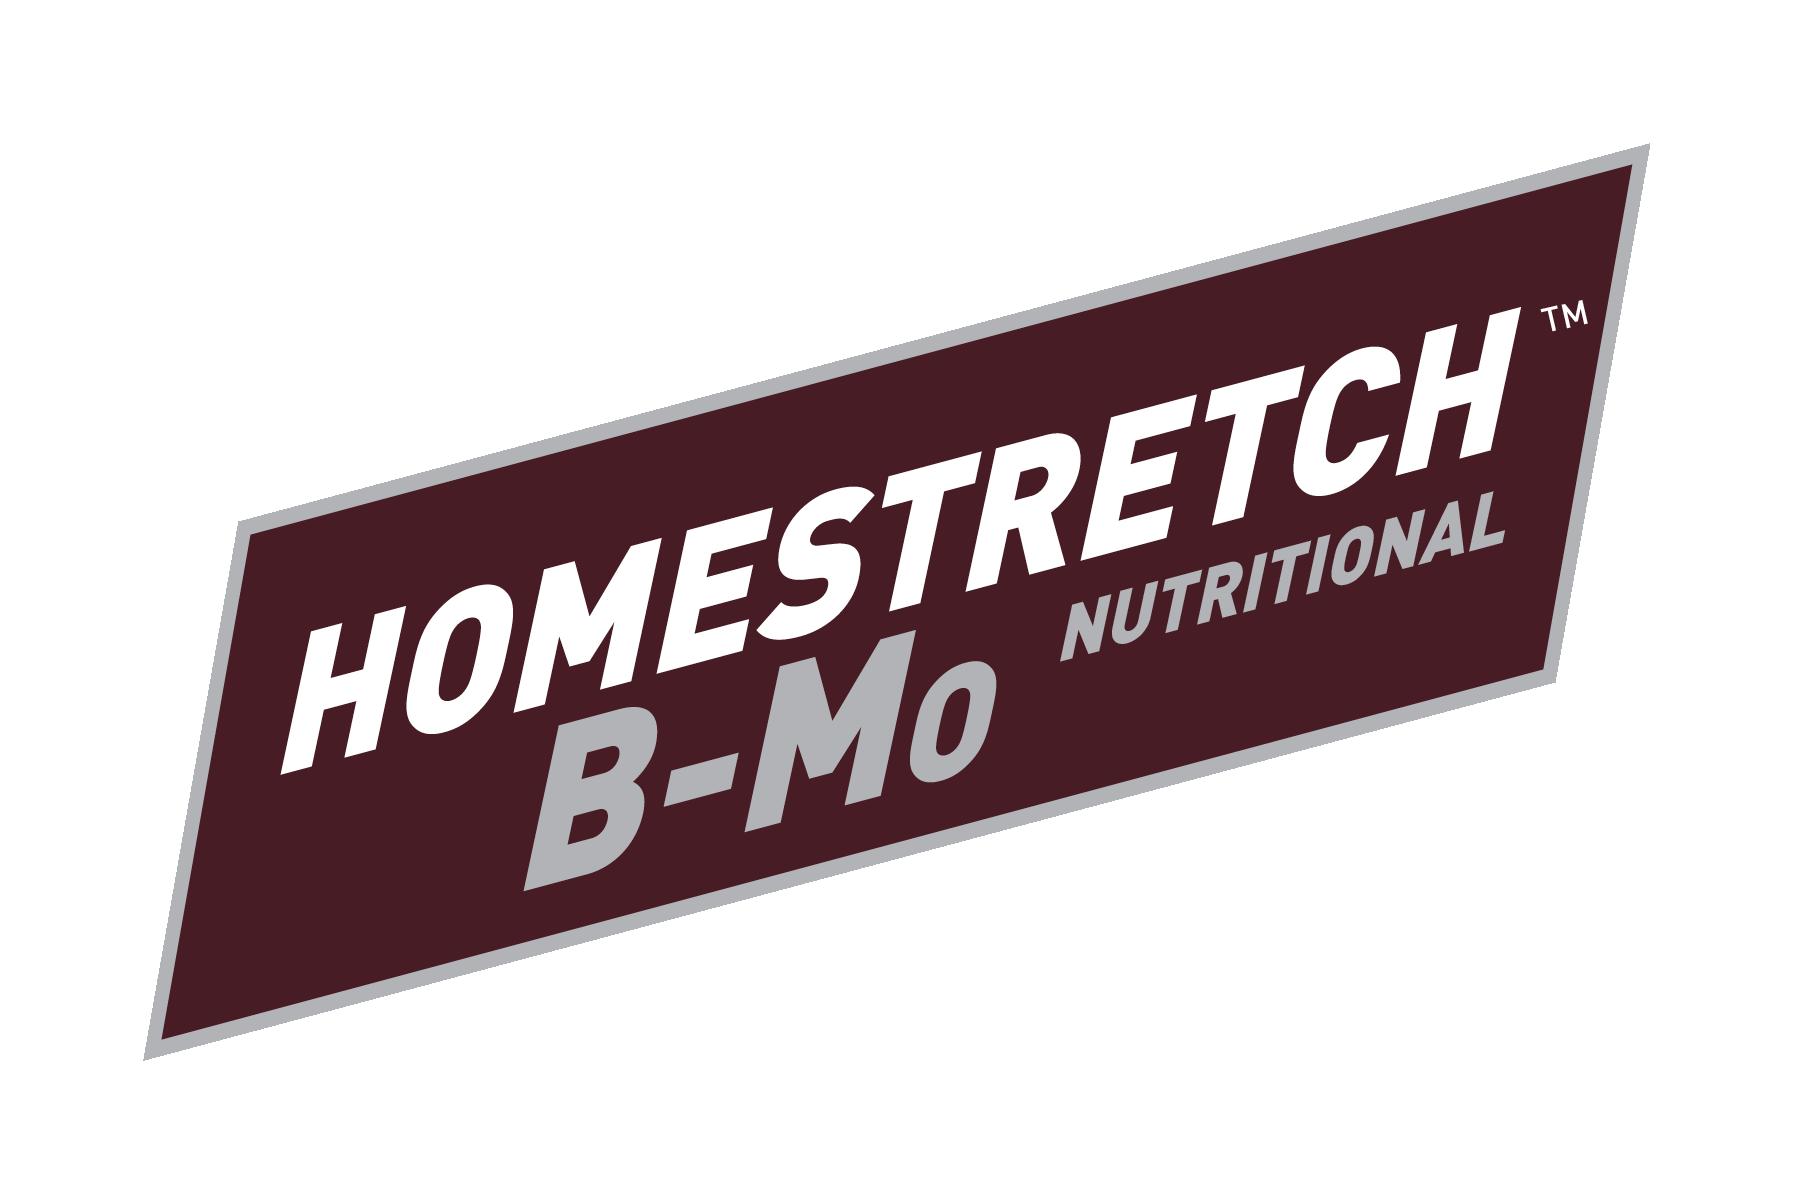 HOMESTRETCH B-MO